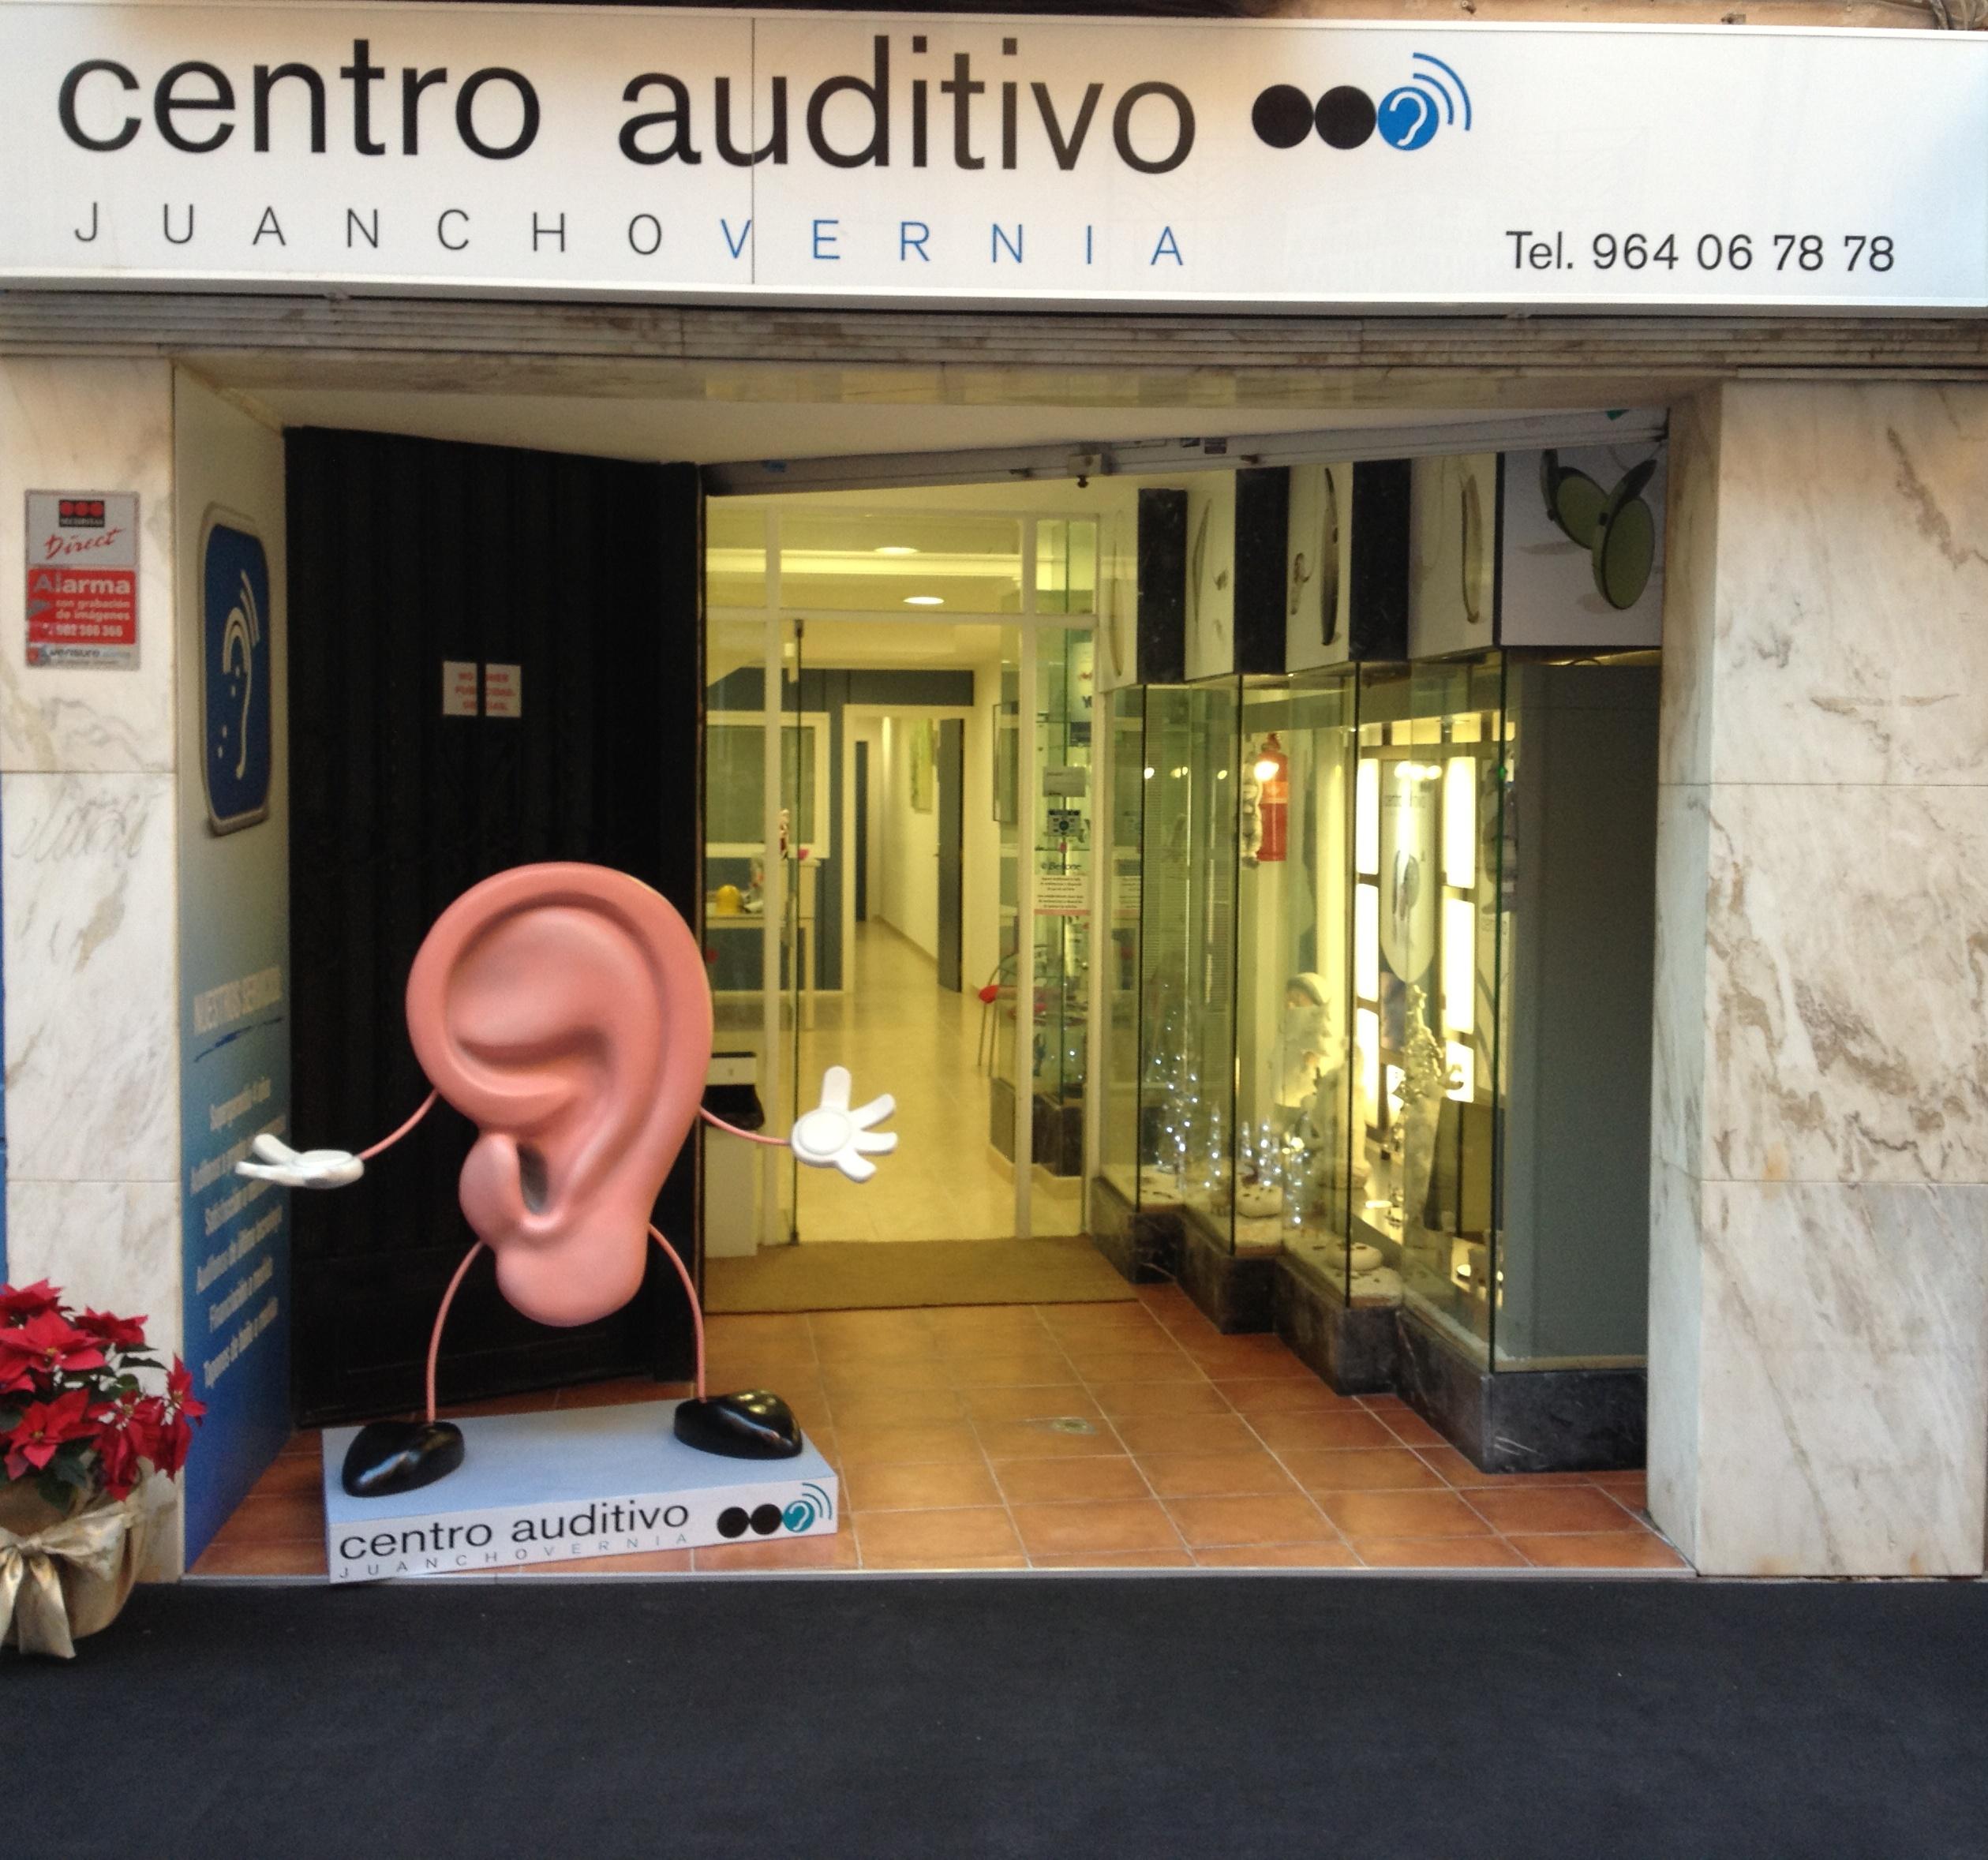 CENTRO AUDITIVO JUANCHO VERNIA